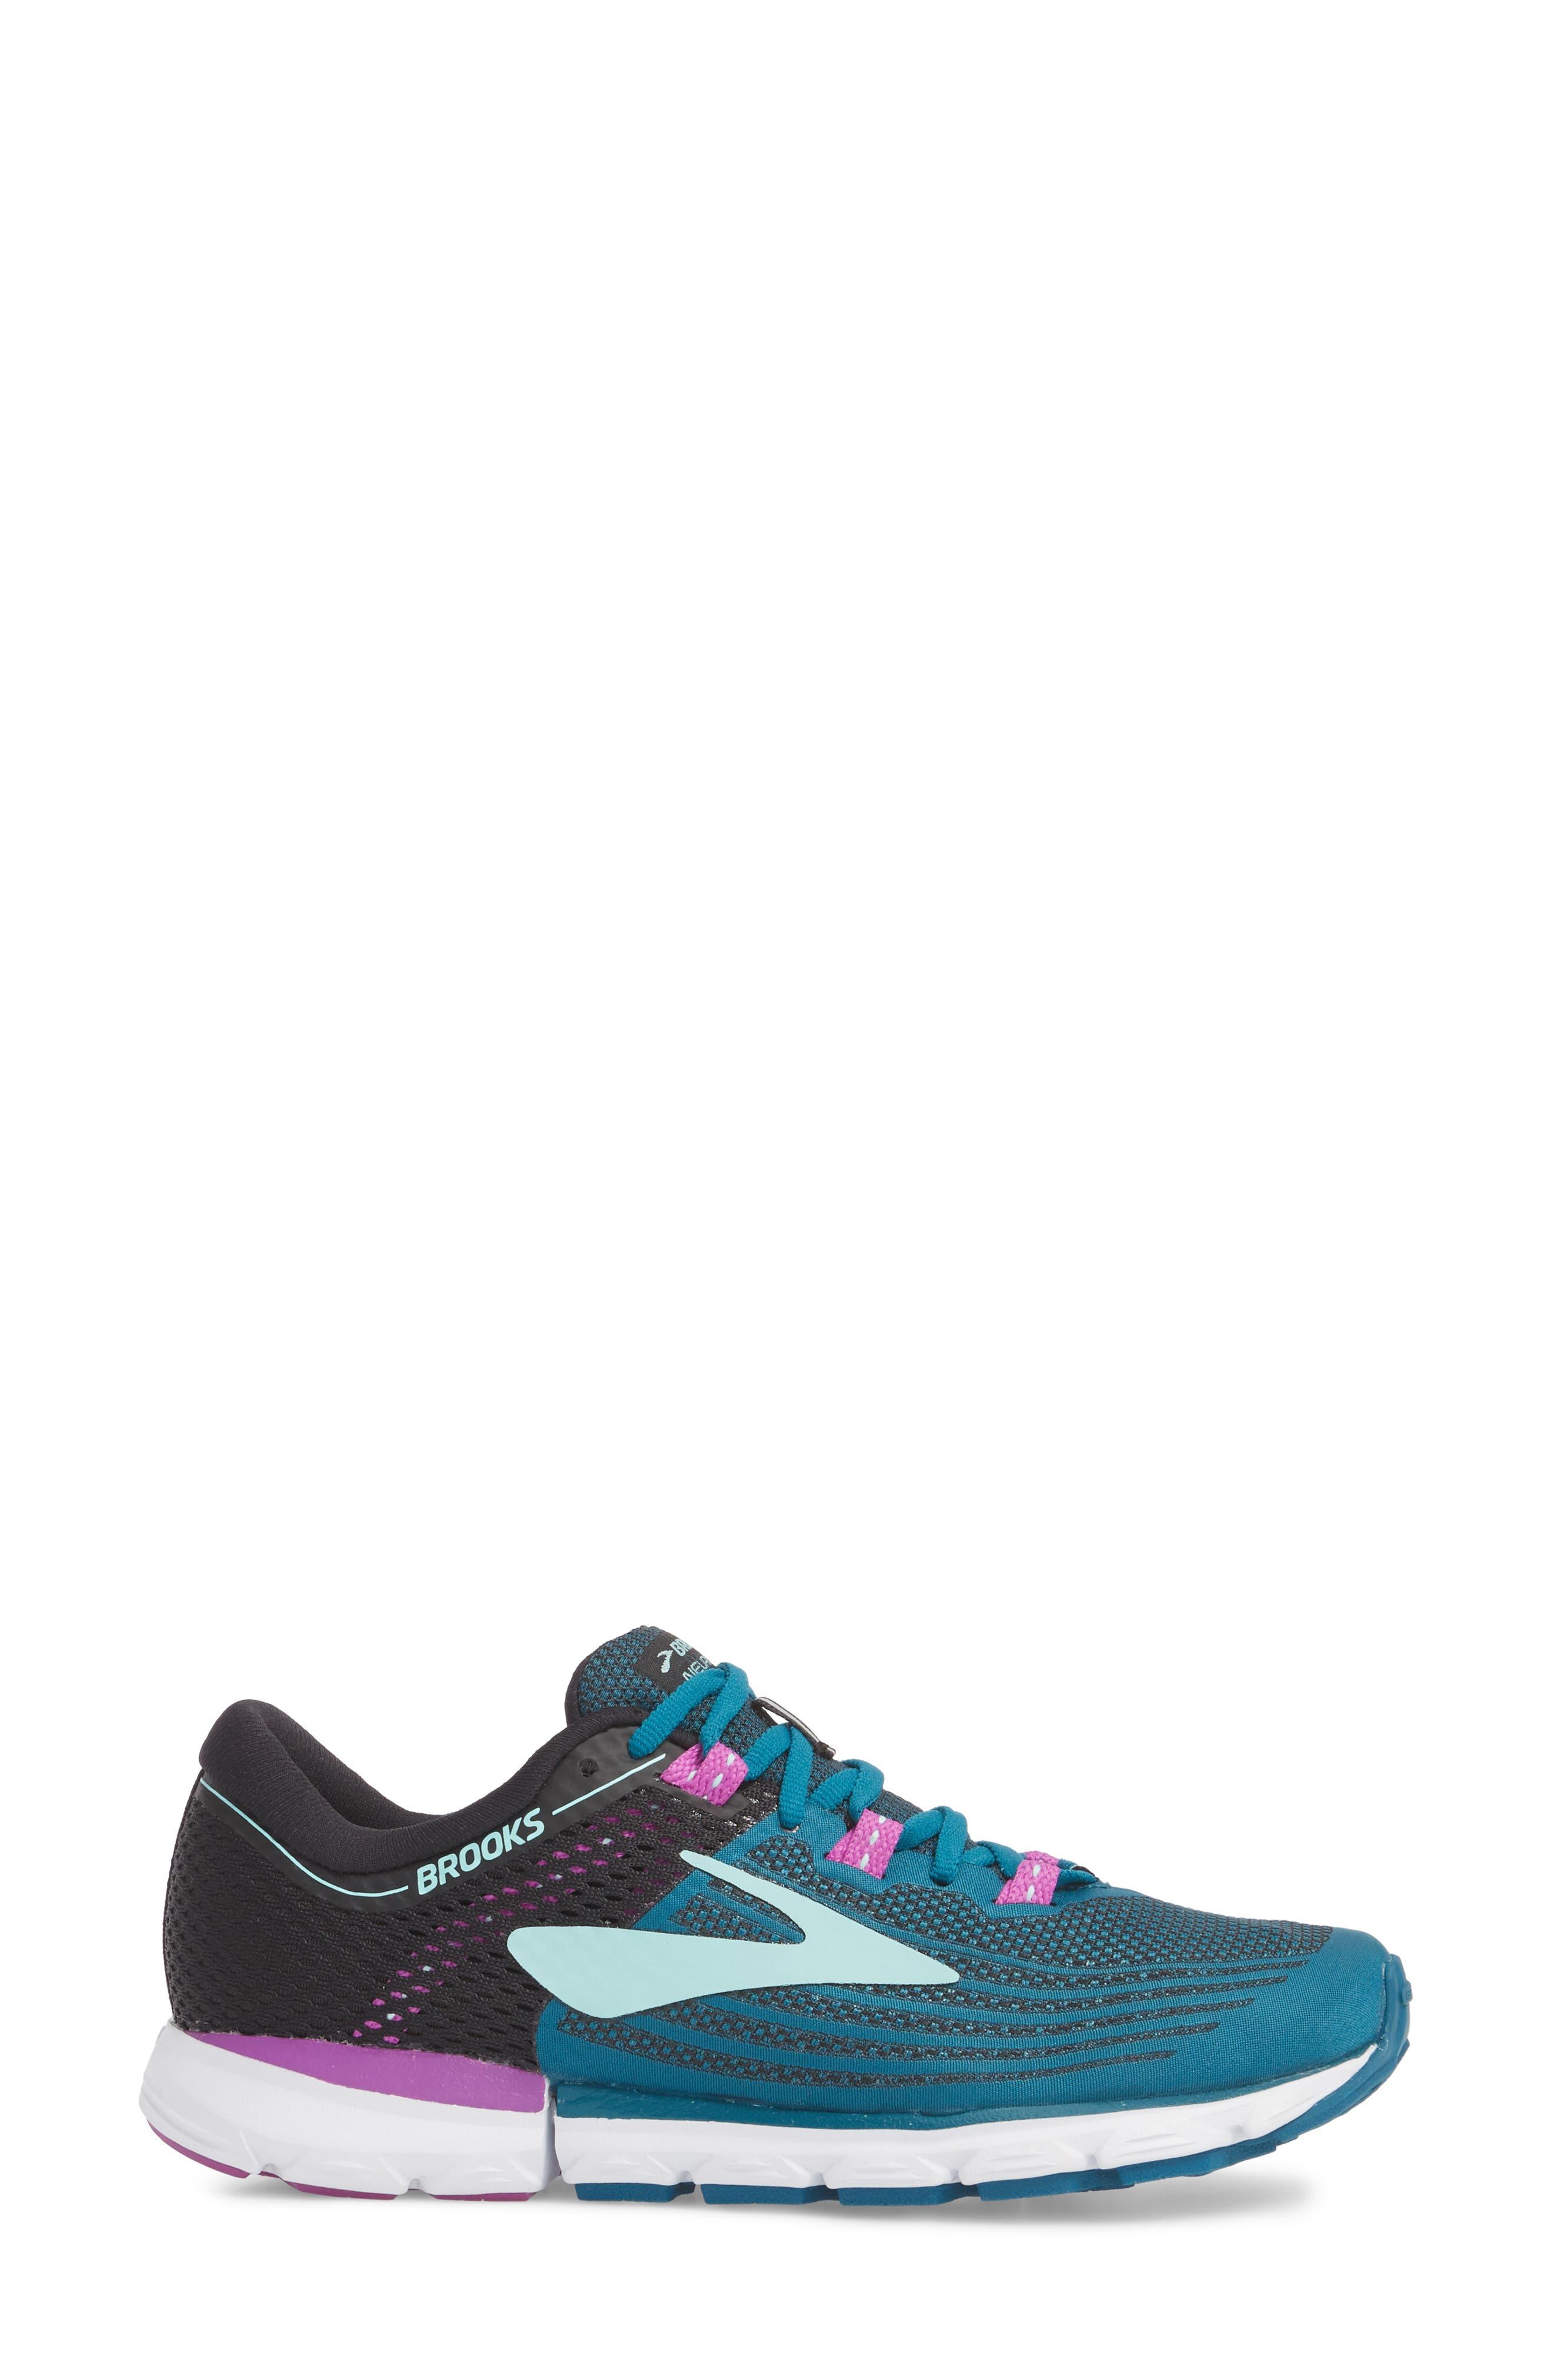 Neuro 3 Running Shoe,                             Alternate thumbnail 3, color,                             LAGOON/ BLACK/ PURPLE